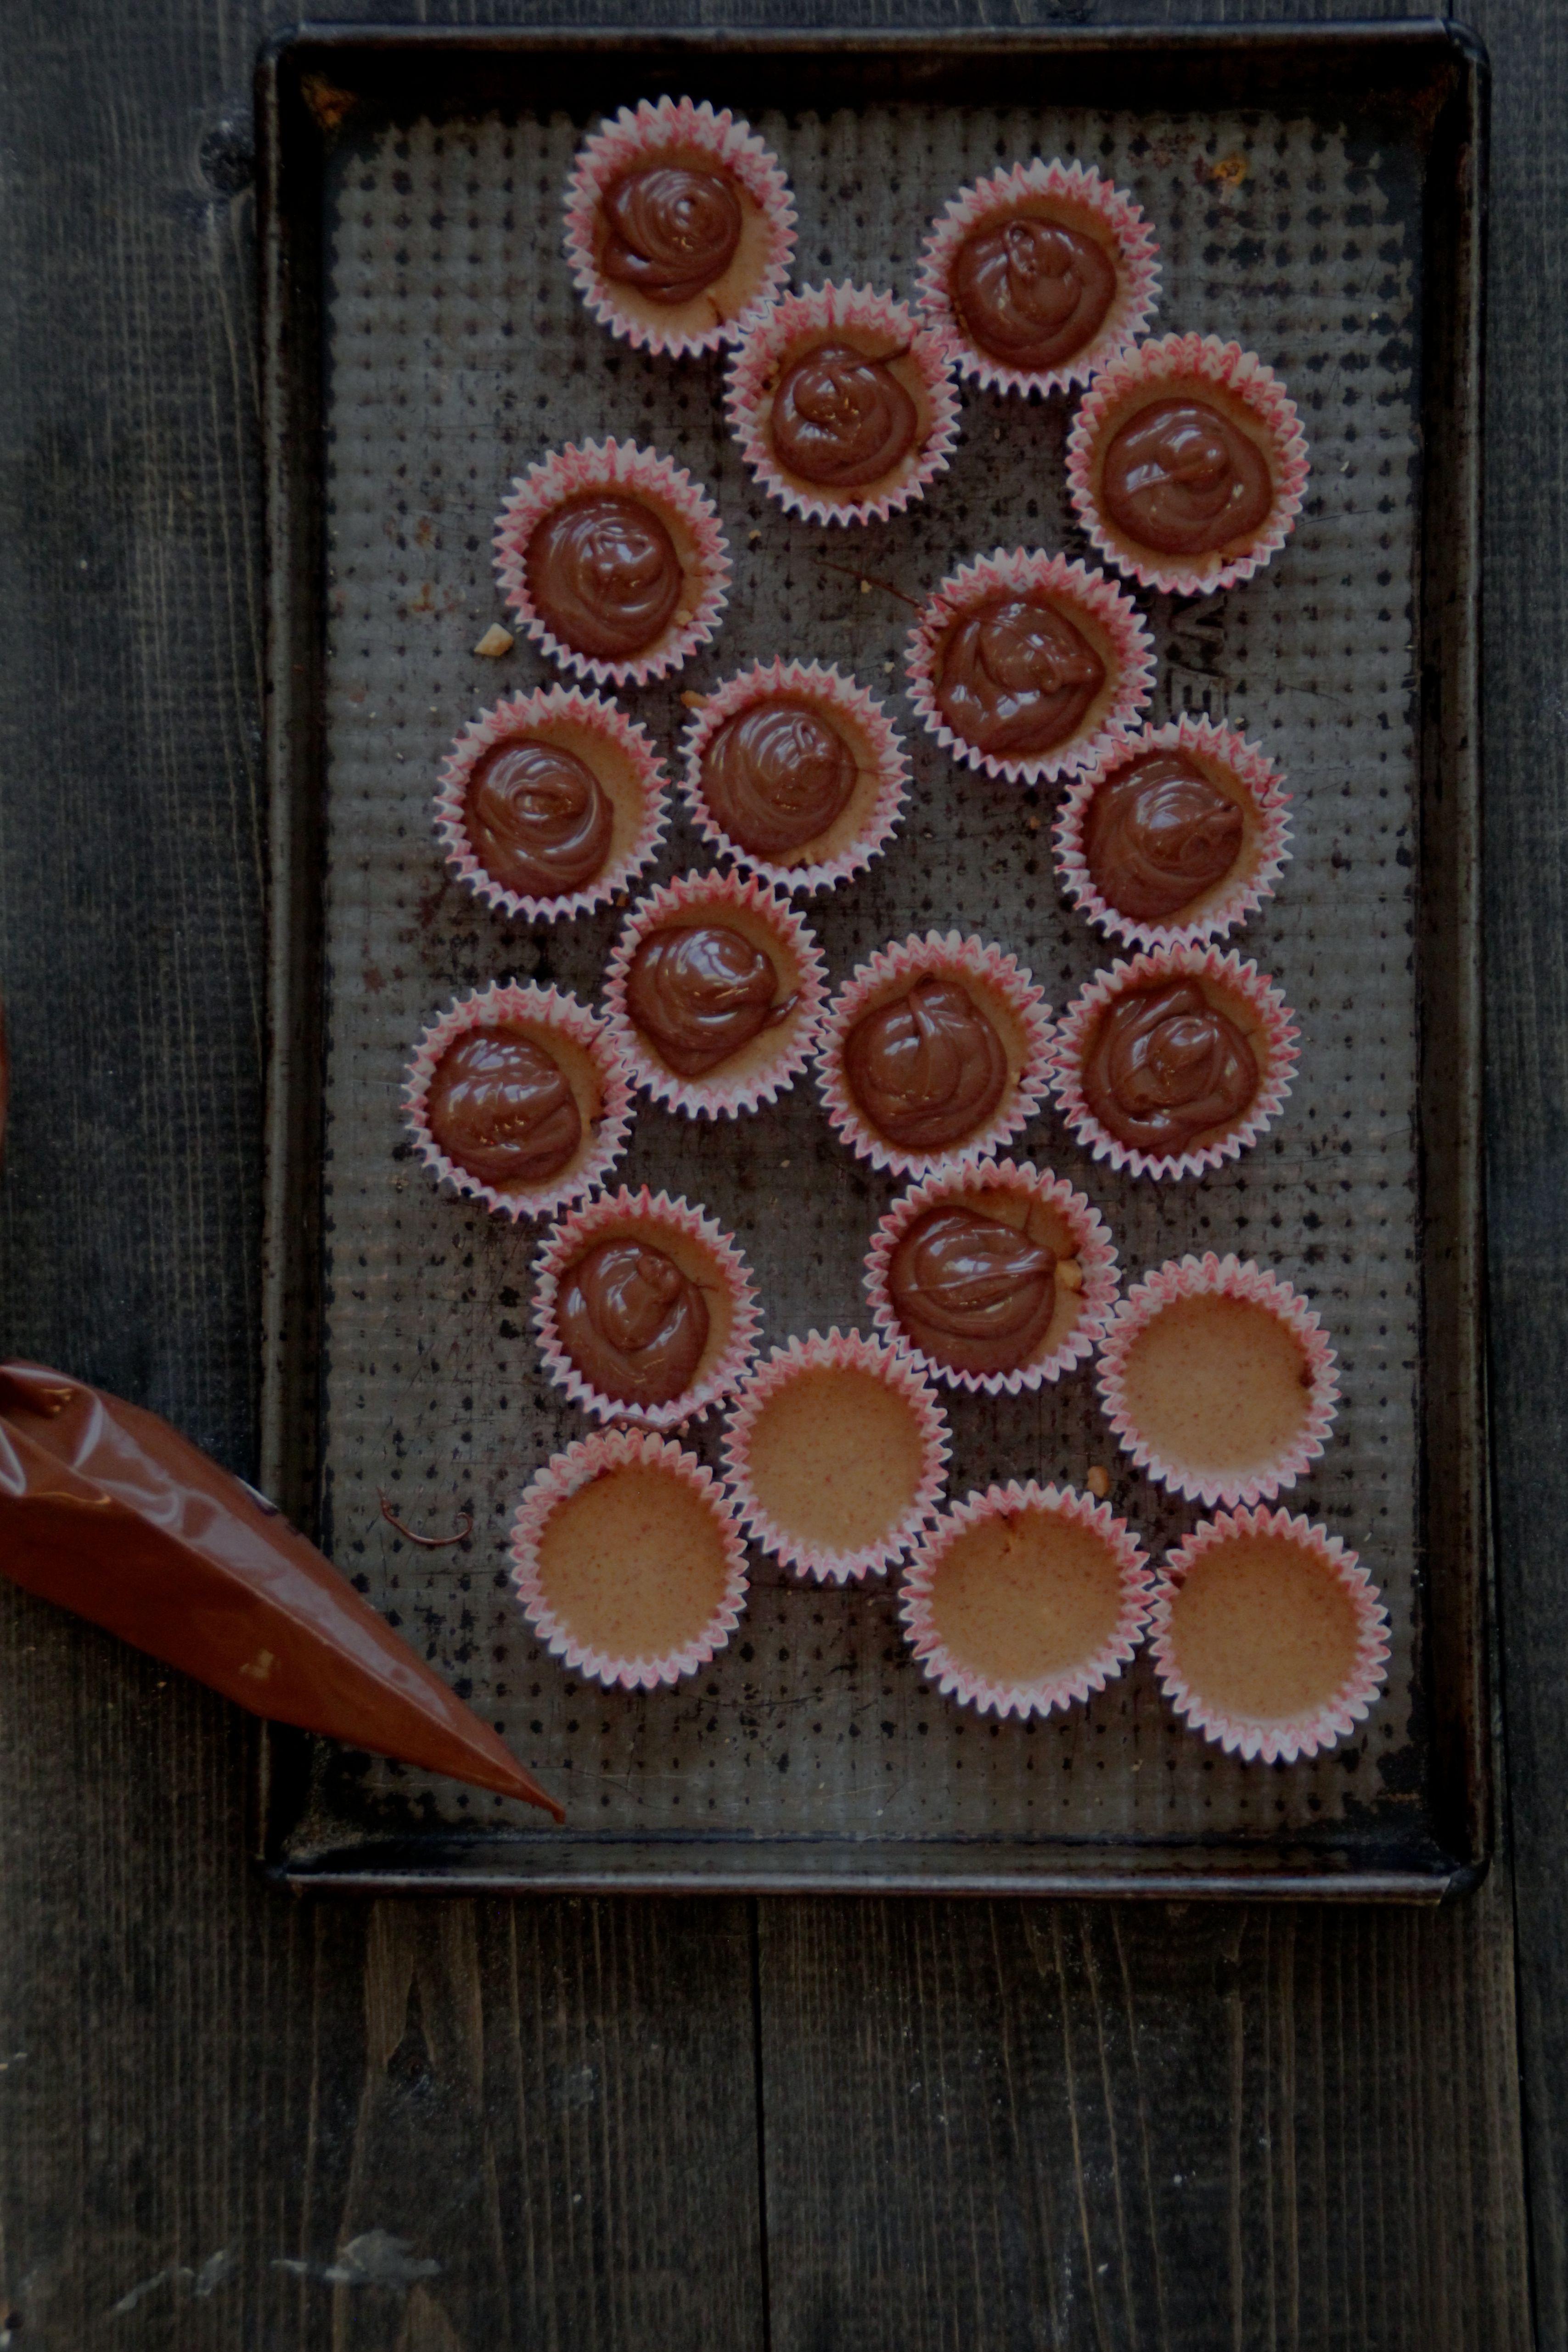 Sjokolade-peanøtt-konfekt